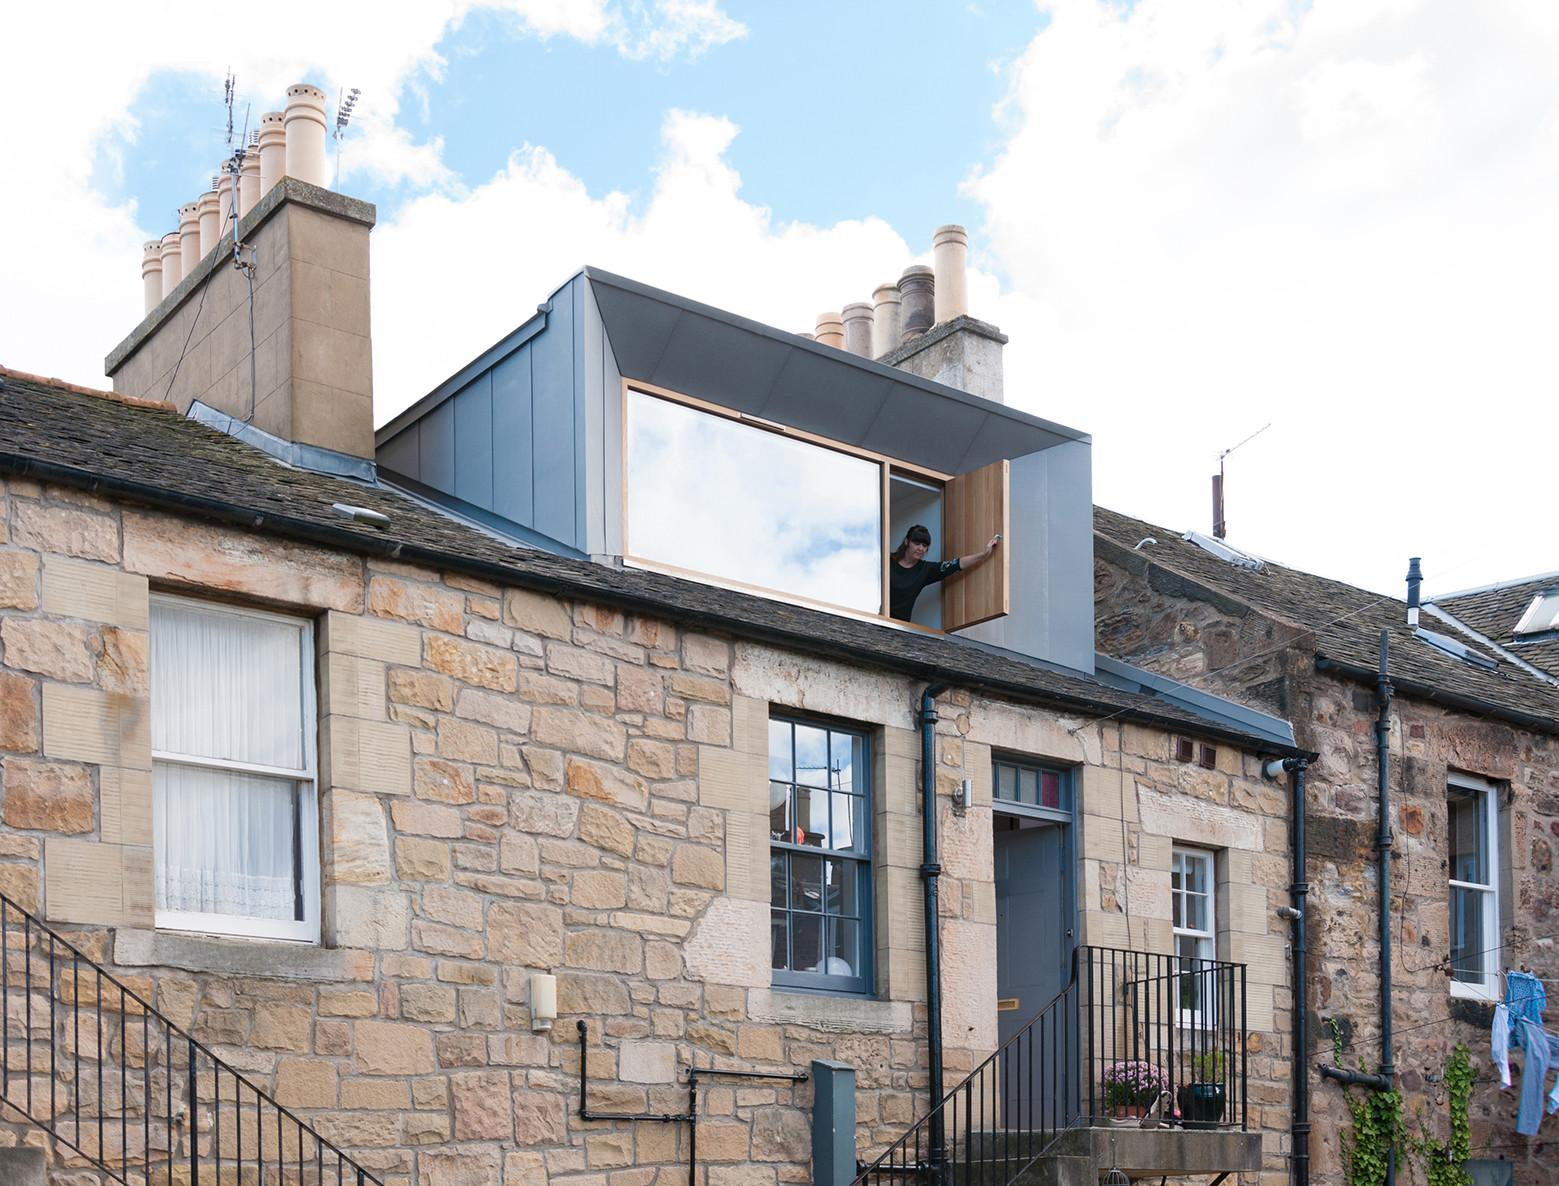 Regency dormer konishi gaffney architects archdaily for Architecture zinc